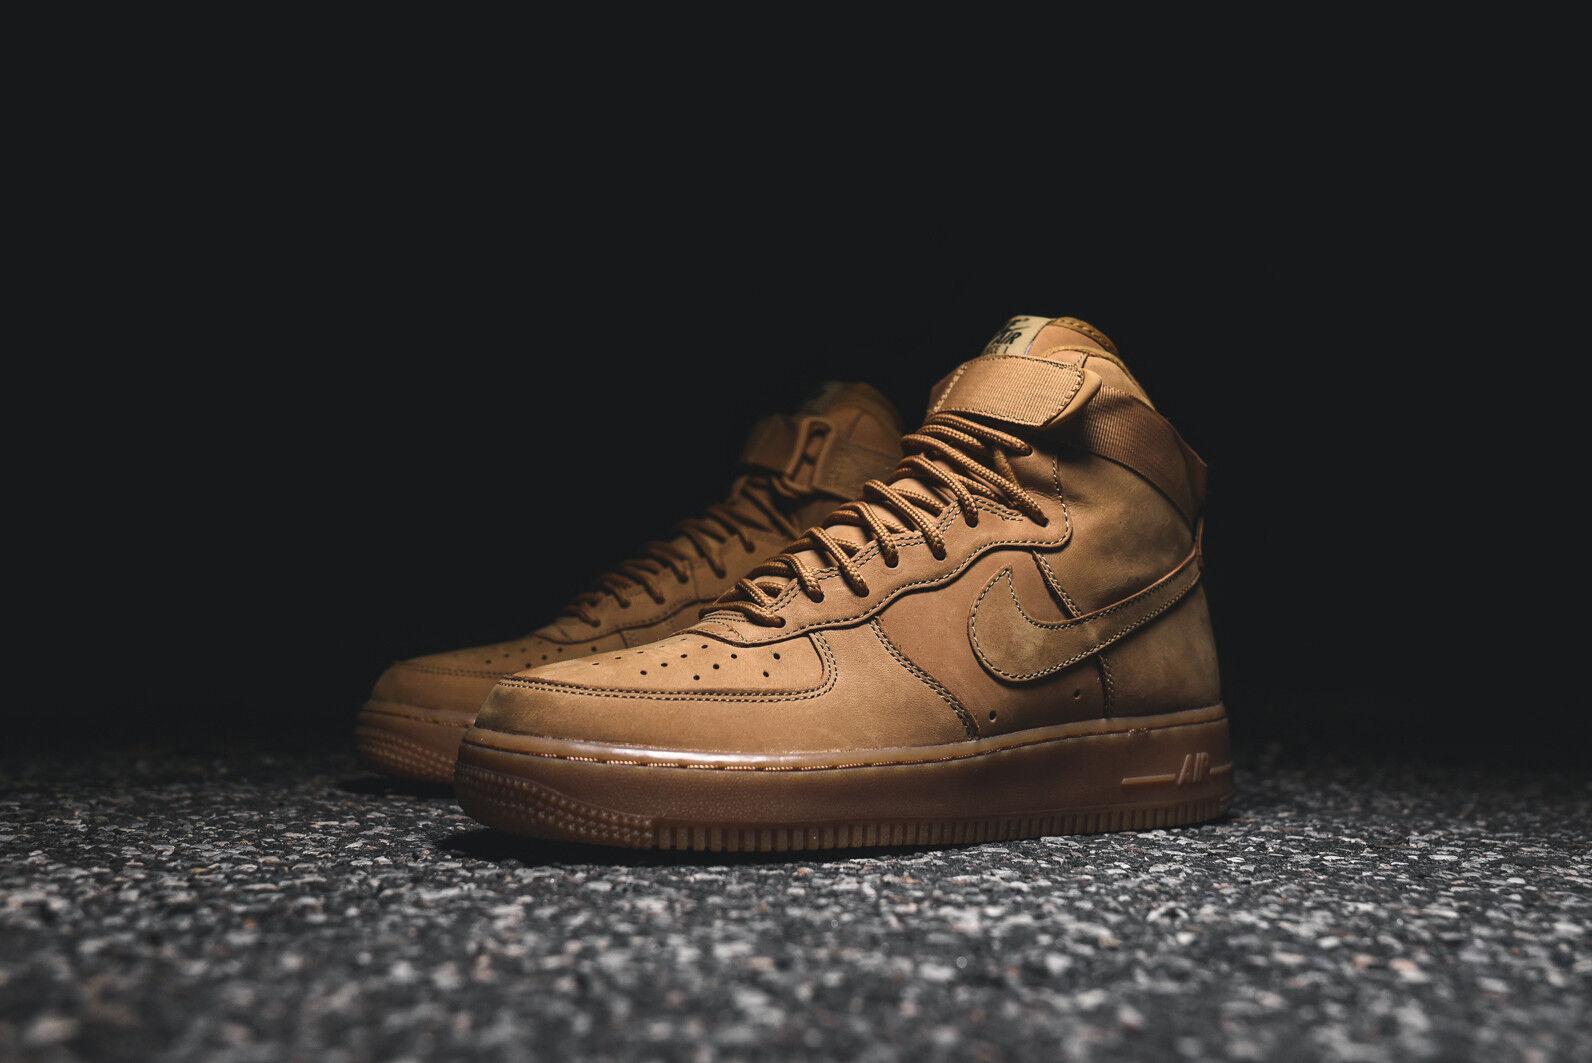 Nike air force 1 high'07 lv8 flax wheat caramel suede 806403